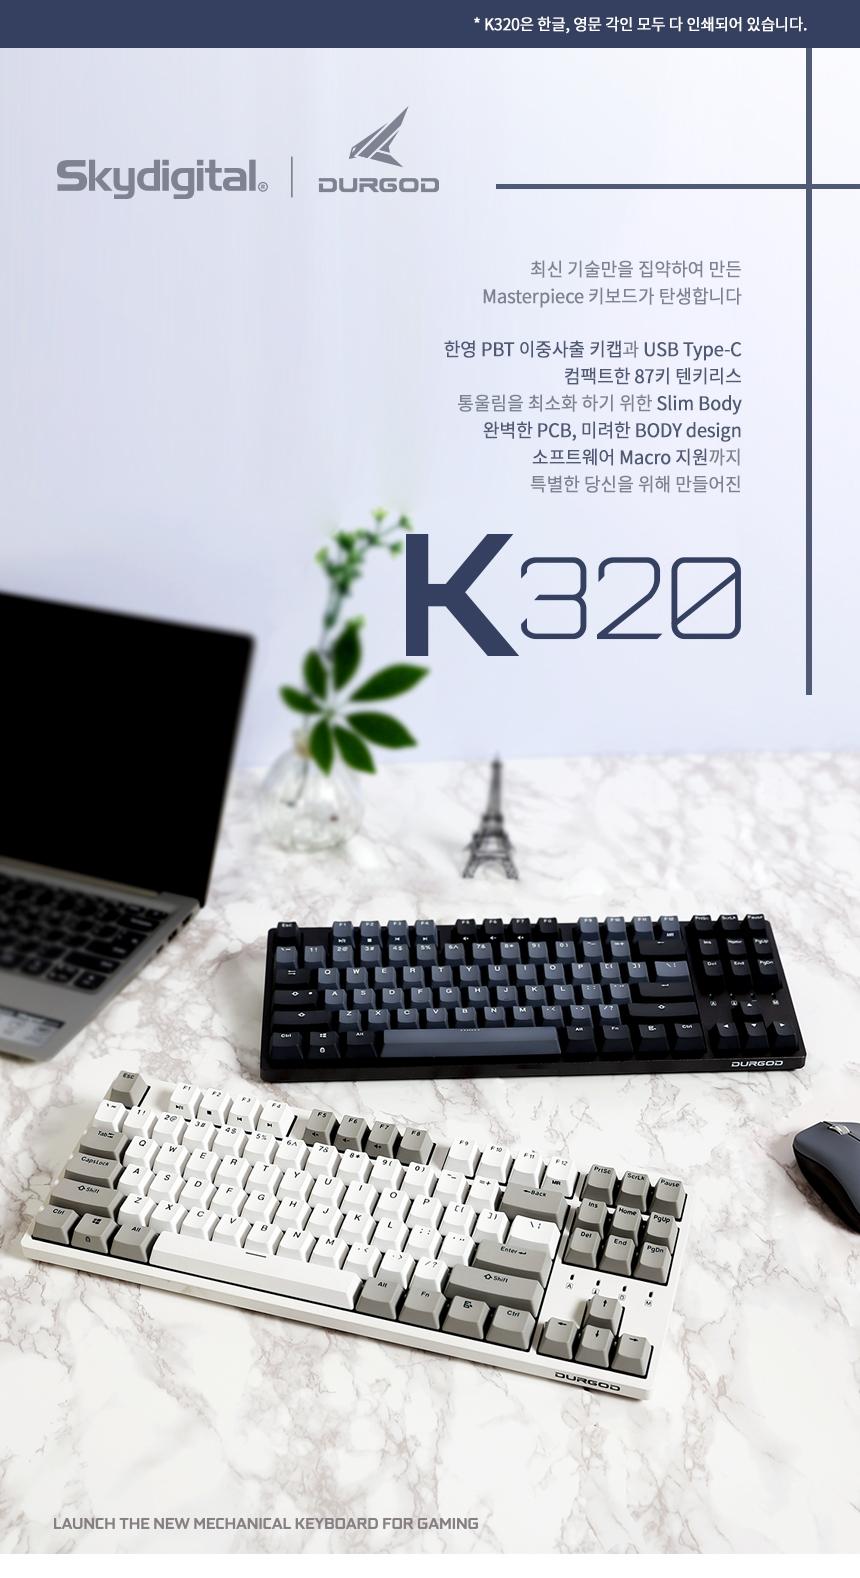 DURGOD TAURUS K320 한영 PBT 기계식 키보드(스페이스 그레이, 은축)